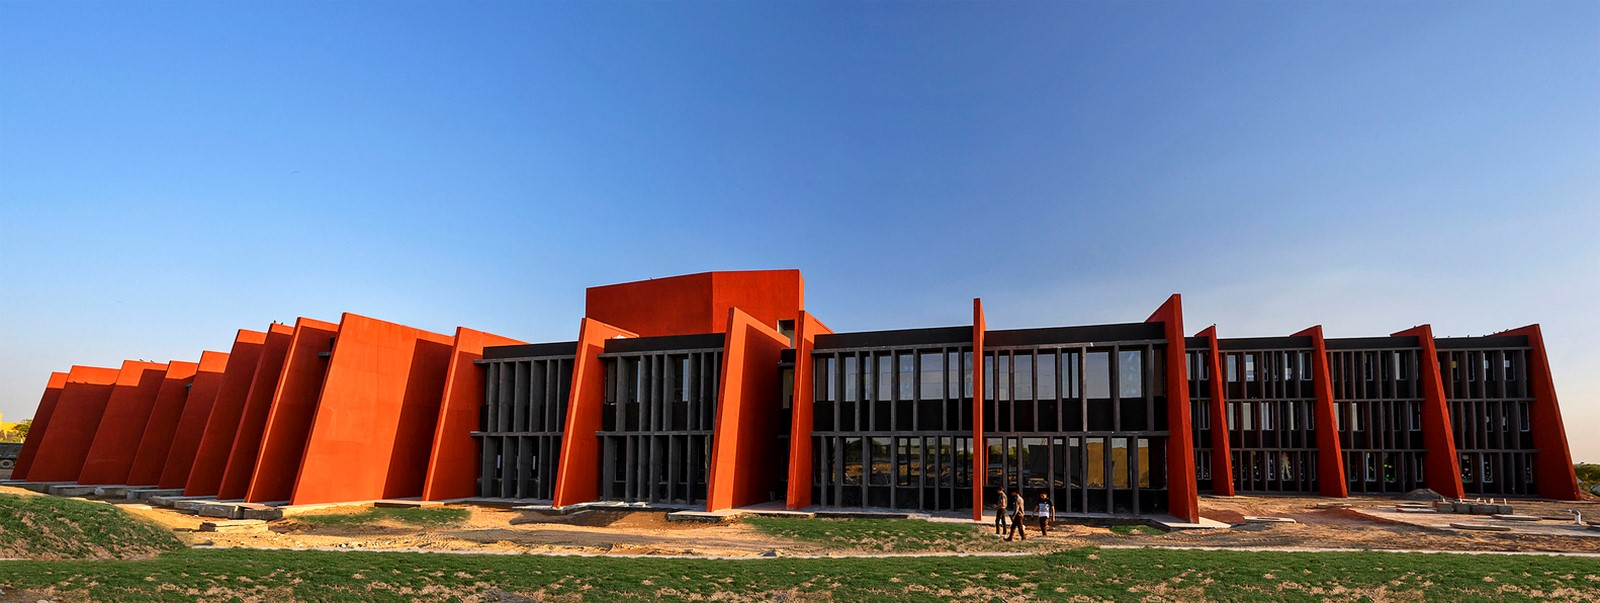 The Rajasthan School, Rajasthan, India Sheet3